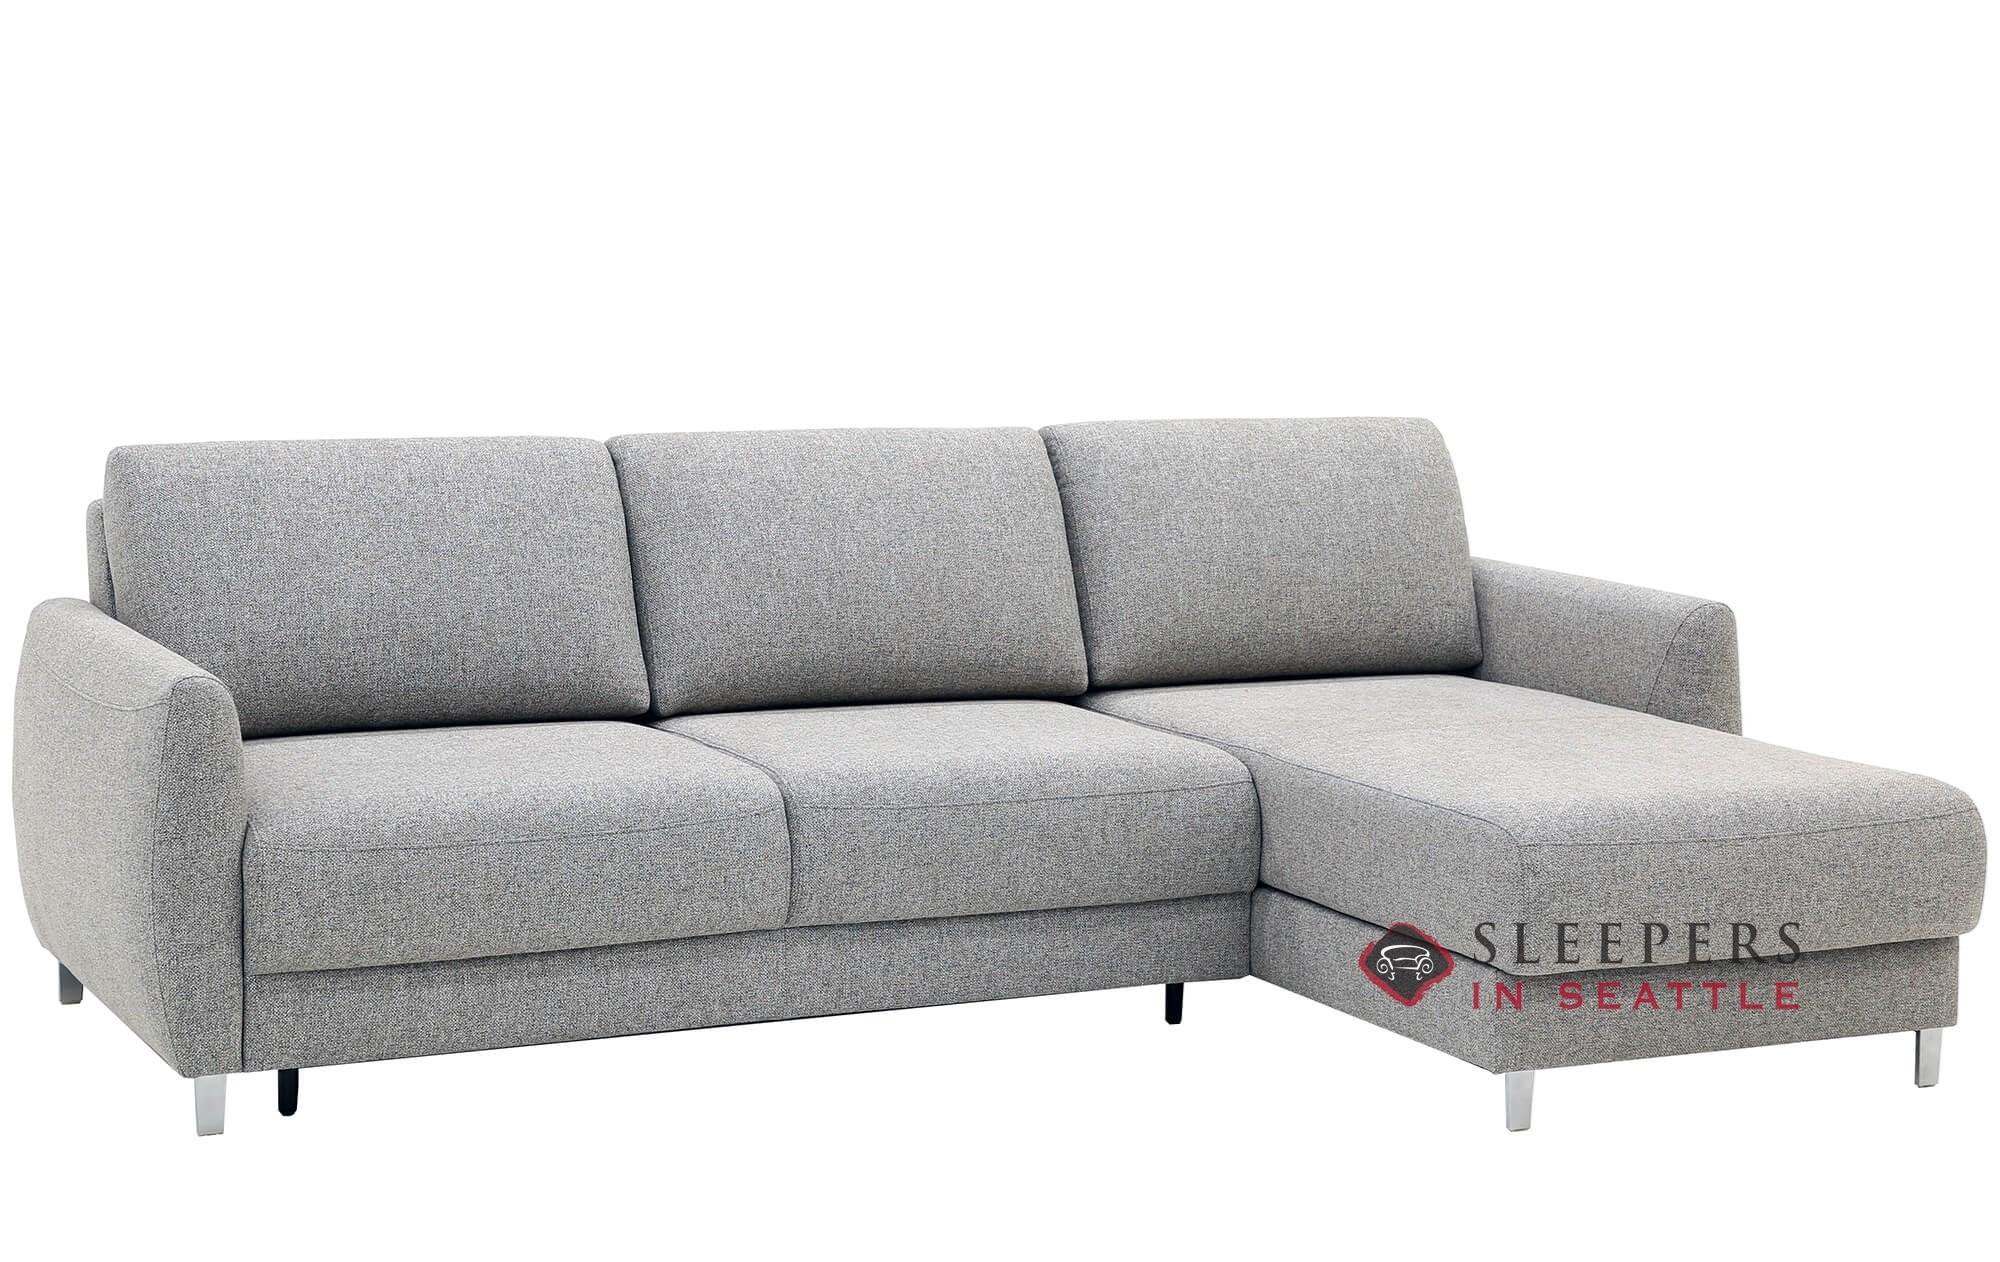 Luonto Delta Loveseat Chaise Sectional Full Sleeper Sofa In Rene 03